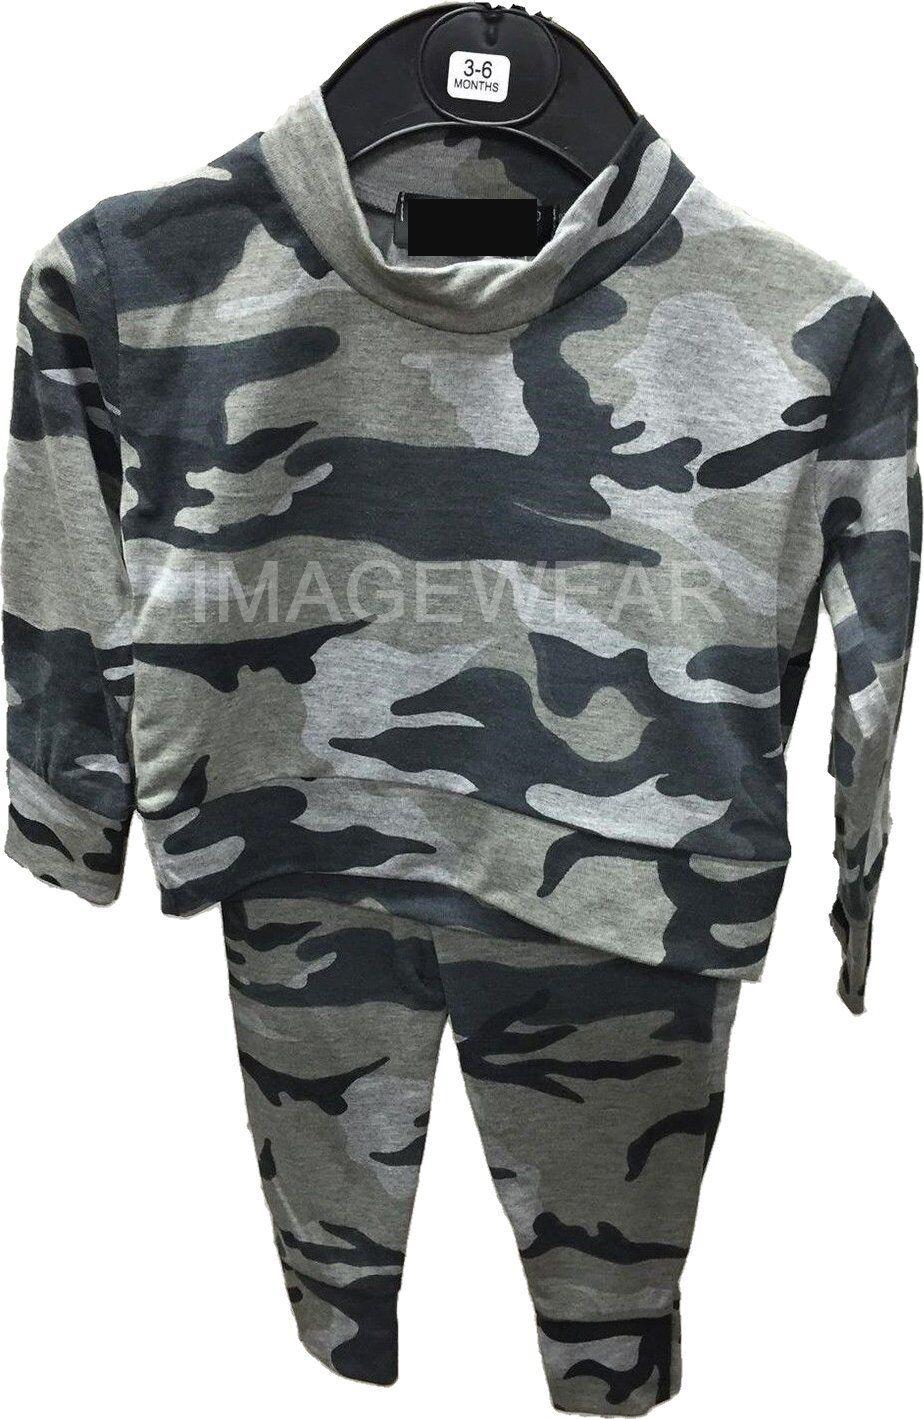 Girls//boys unisex Babies Camo Blue Tracksuit Kids Loungewear Suit 6mnths-13yrs